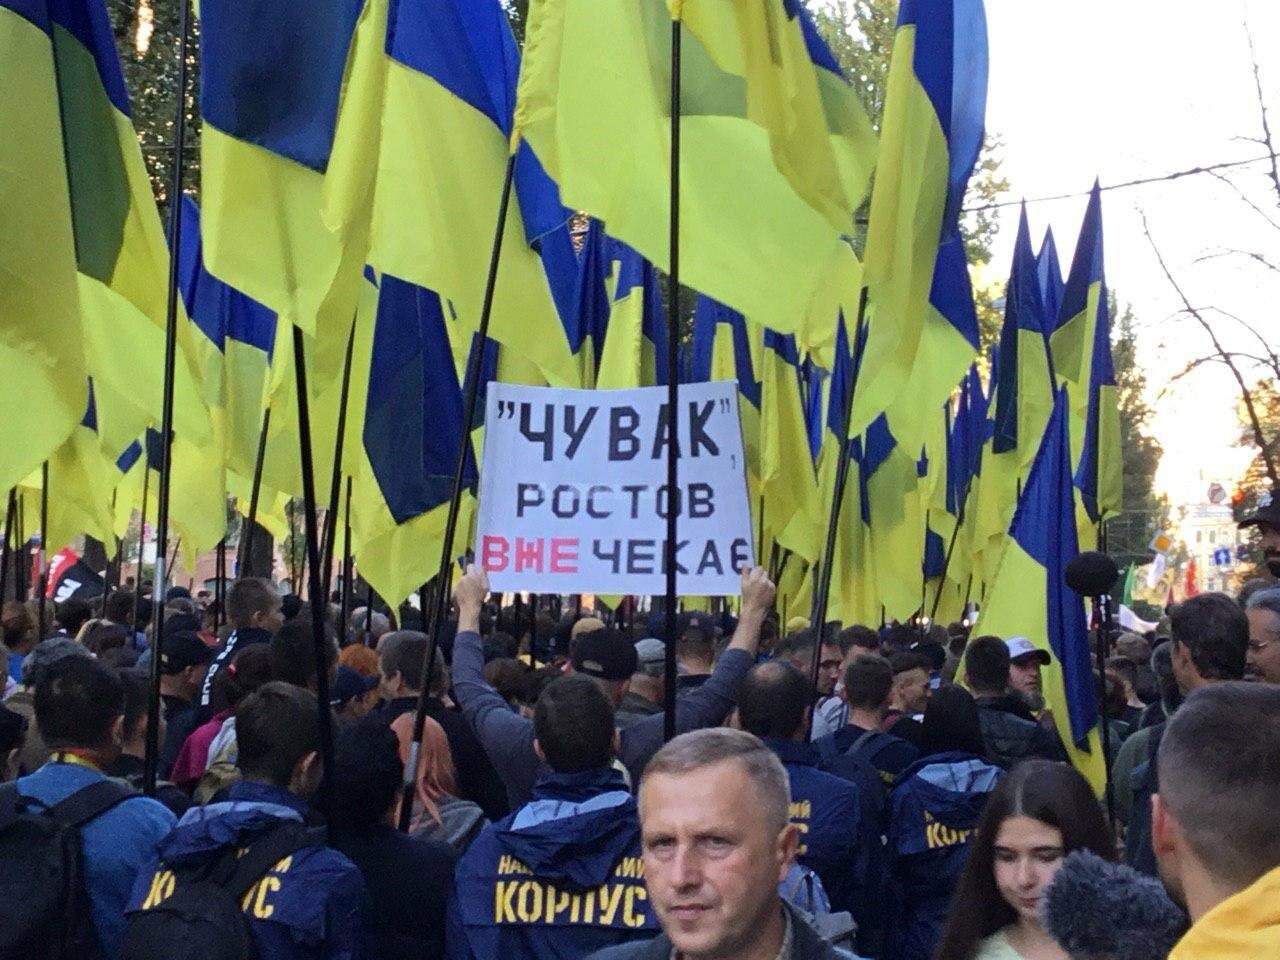 Криворожане поддержали Марш сопротивления капитуляции в Киеве, - ФОТО, ВИДЕО, ОБНОВЛЕНО, фото-10